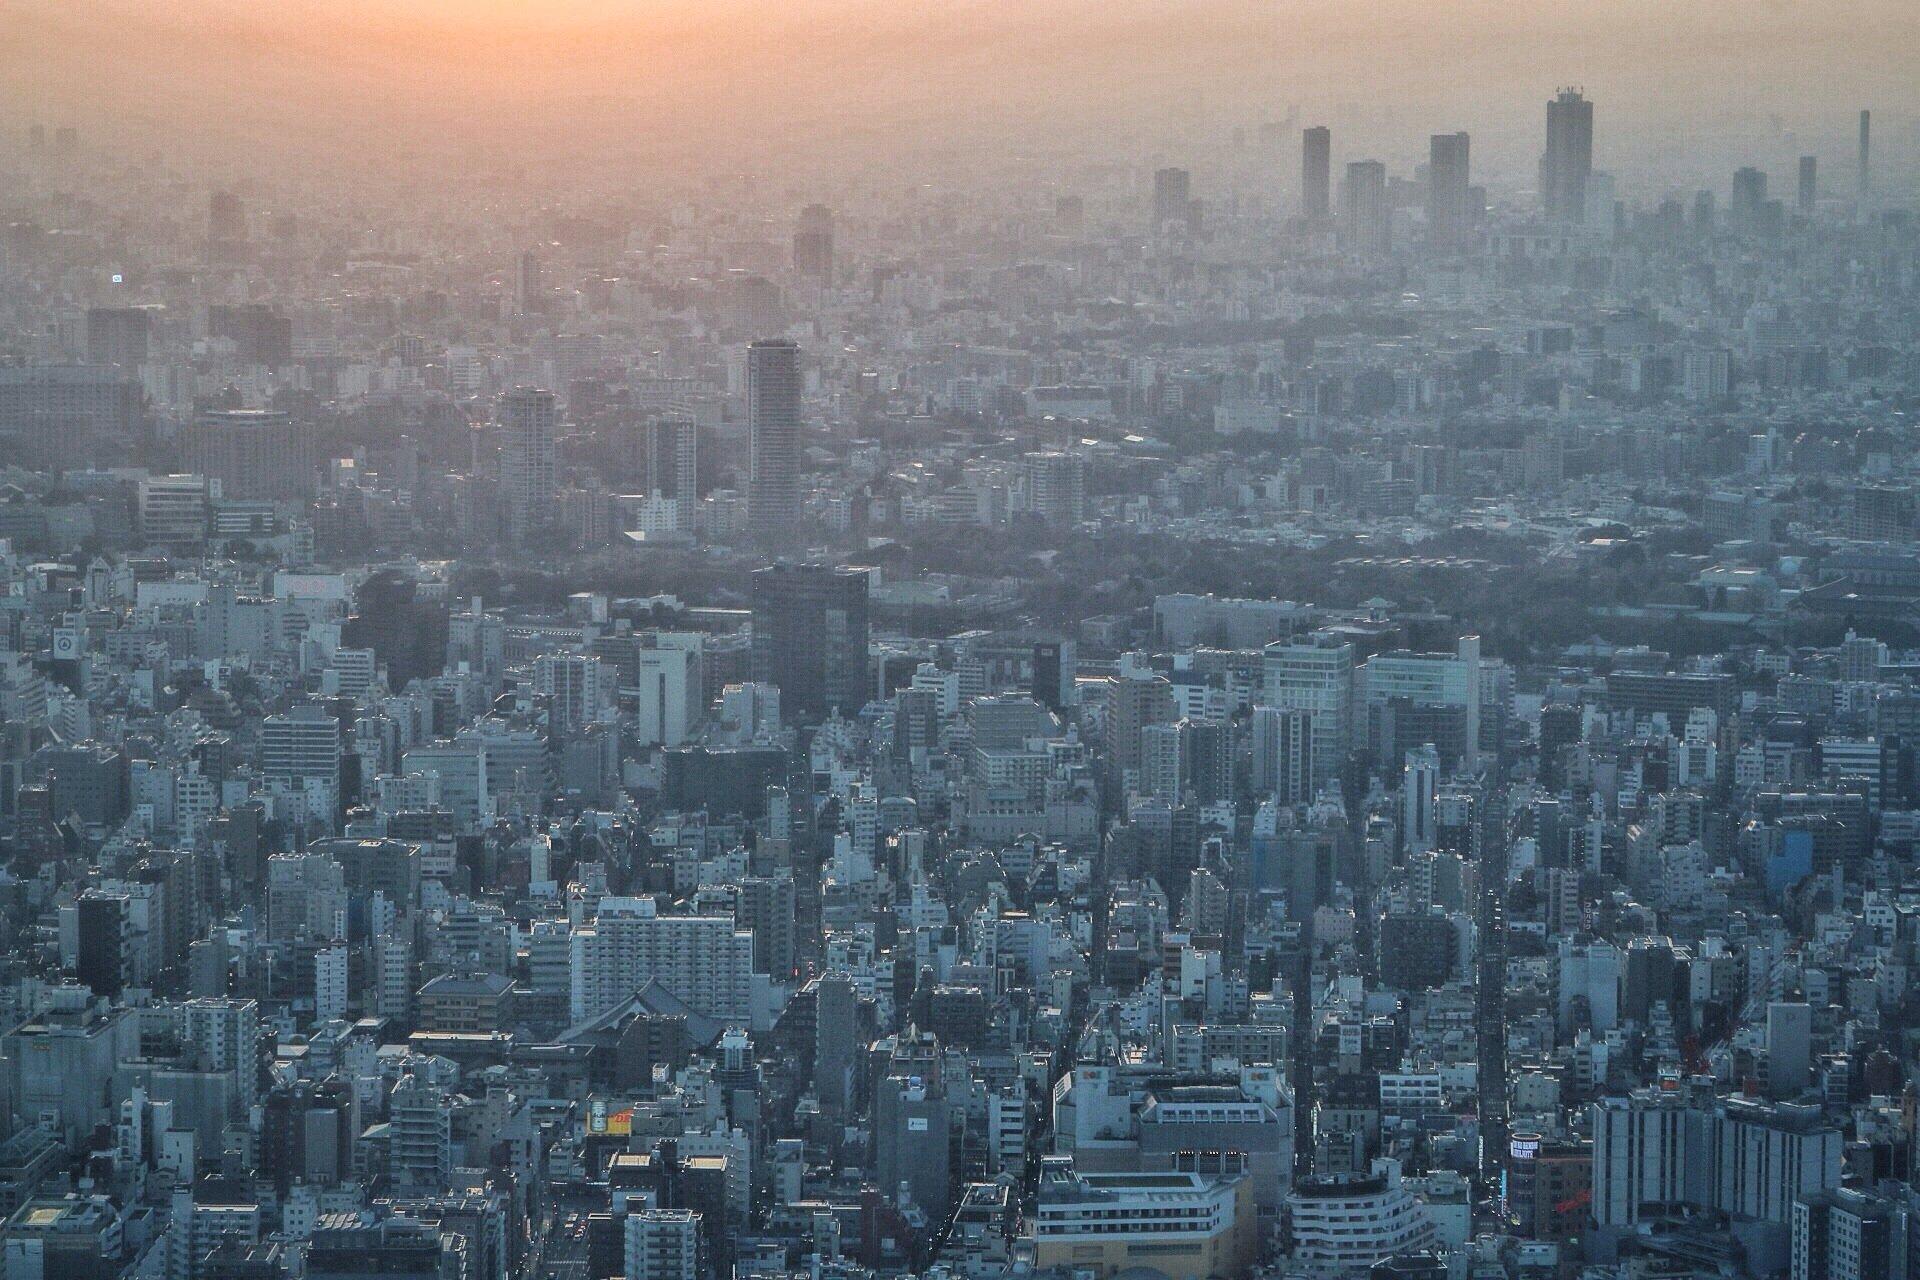 tokyo-from-above-3-kasuma-photo-blog